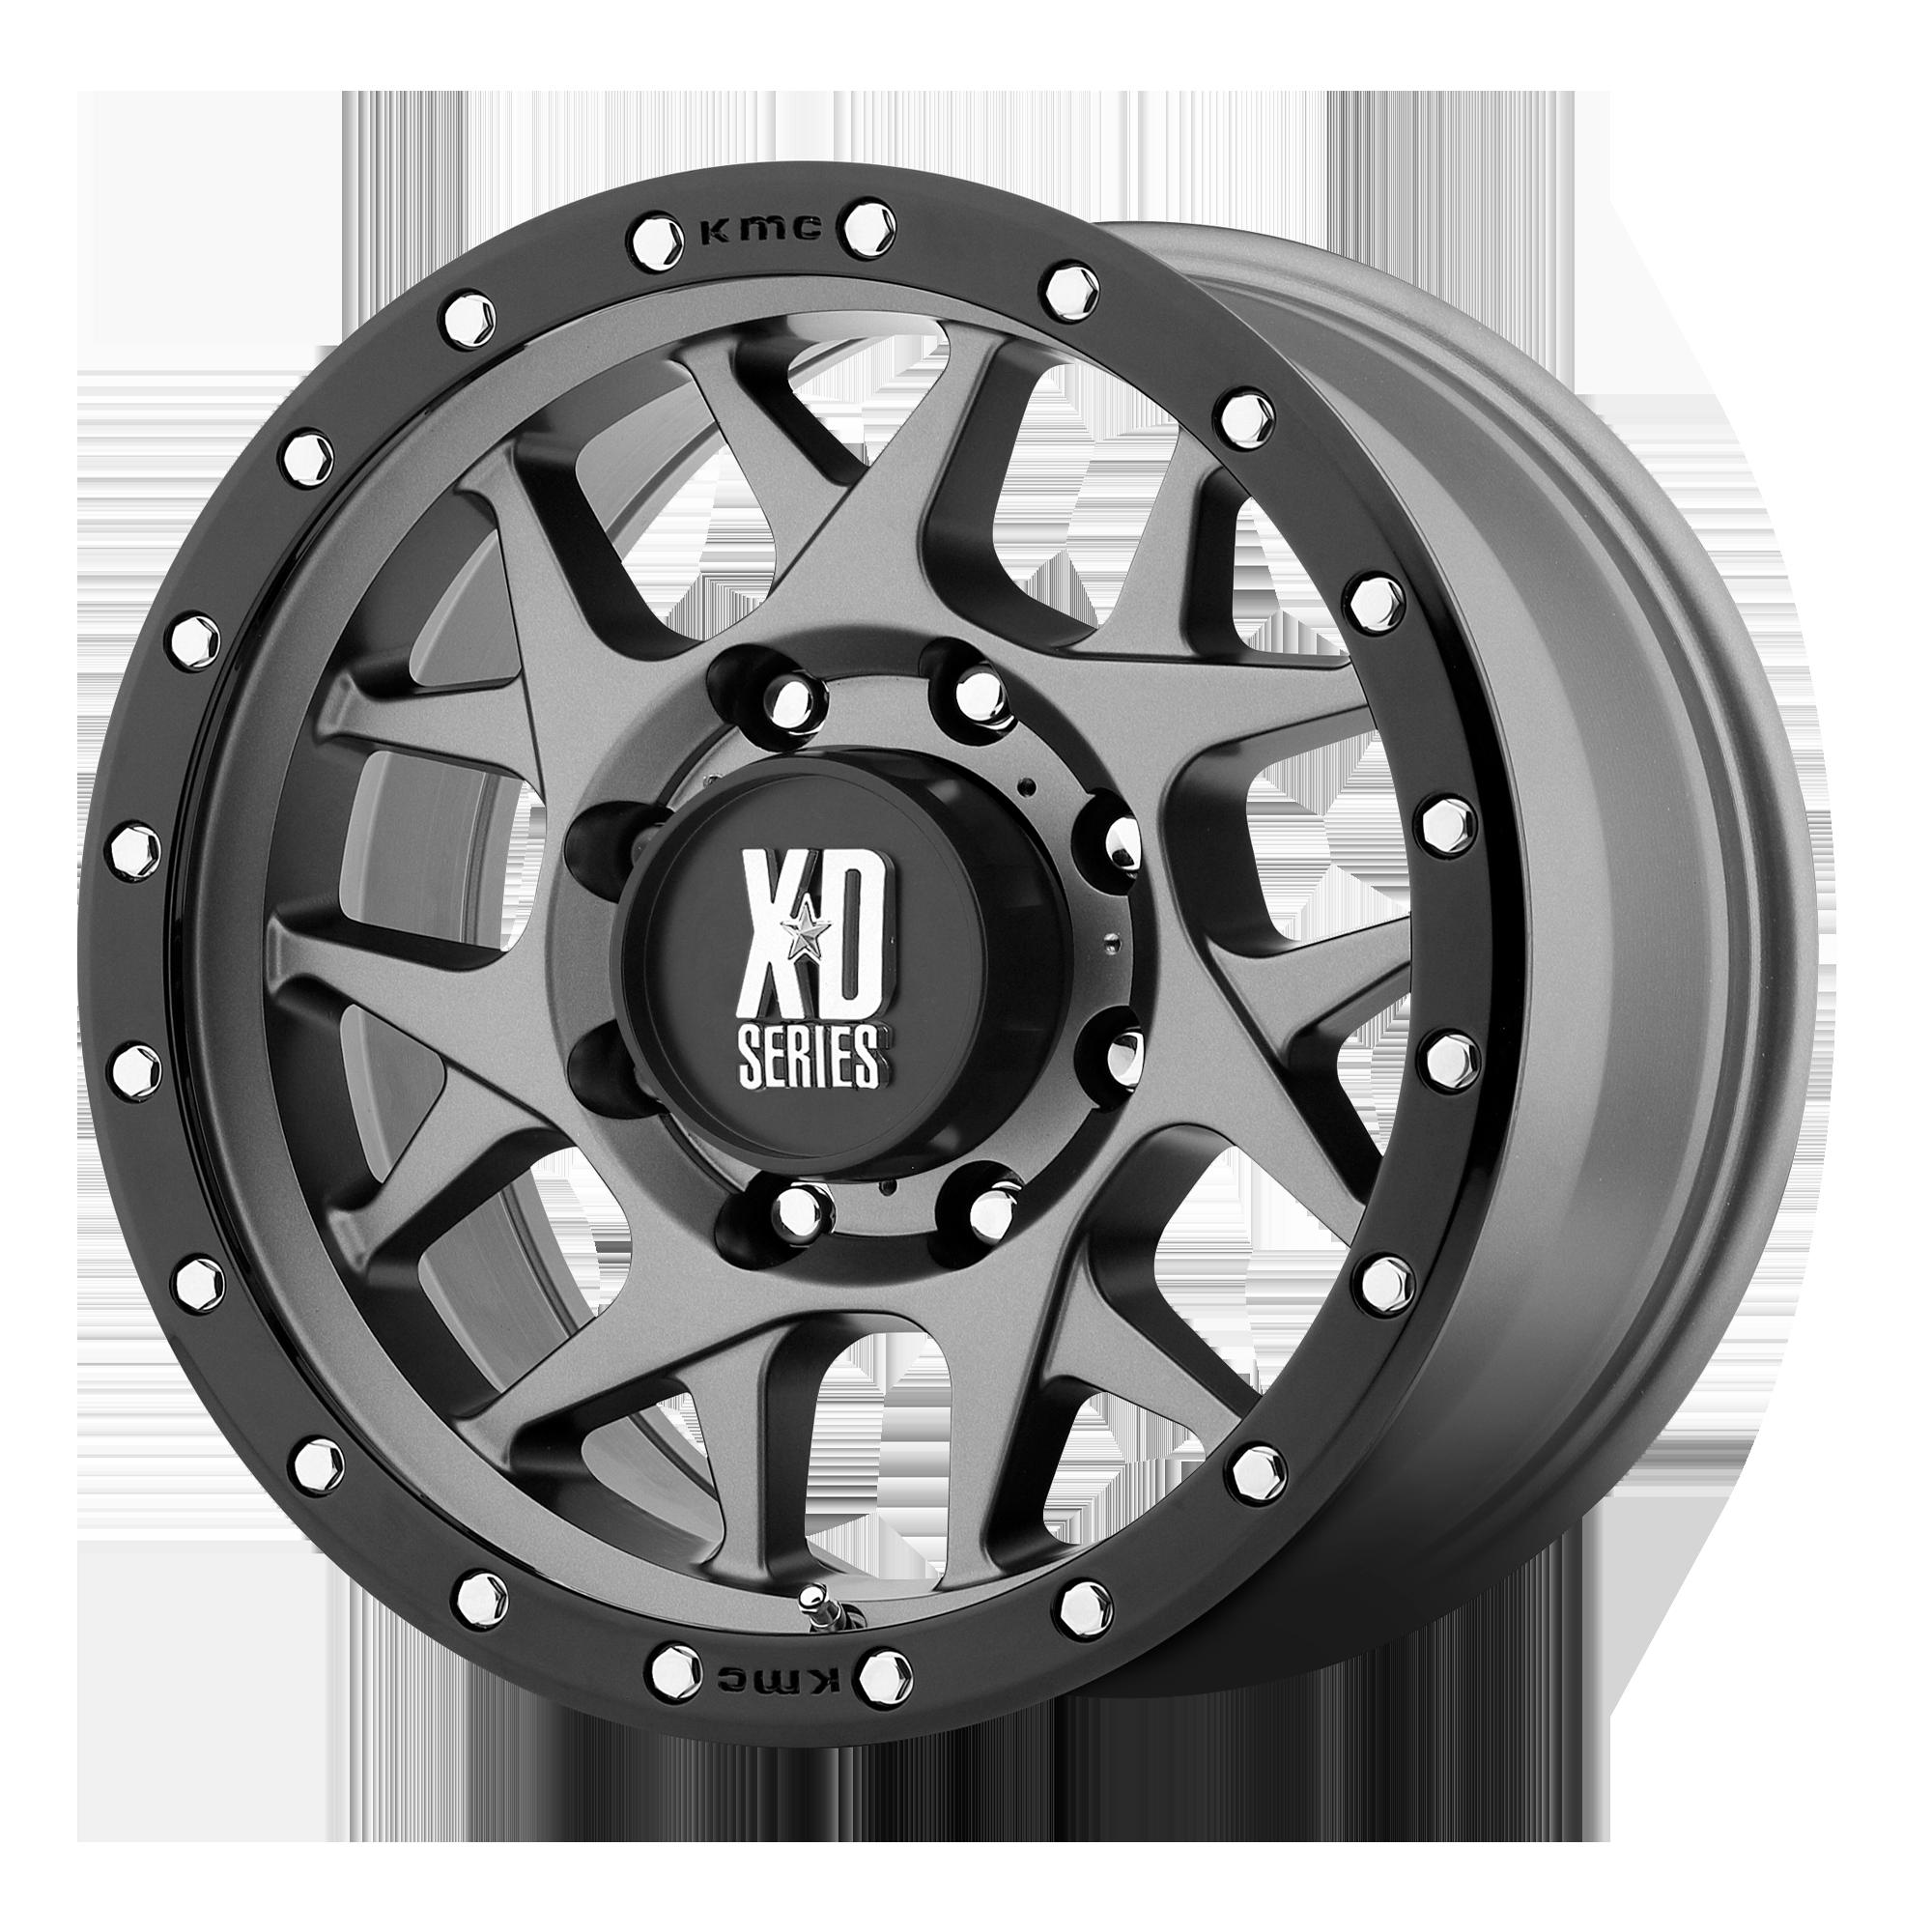 XD SERIES XD127 BULLY hliníkové disky 9x17 5x127 ET-12 Matte Gray Black Ring